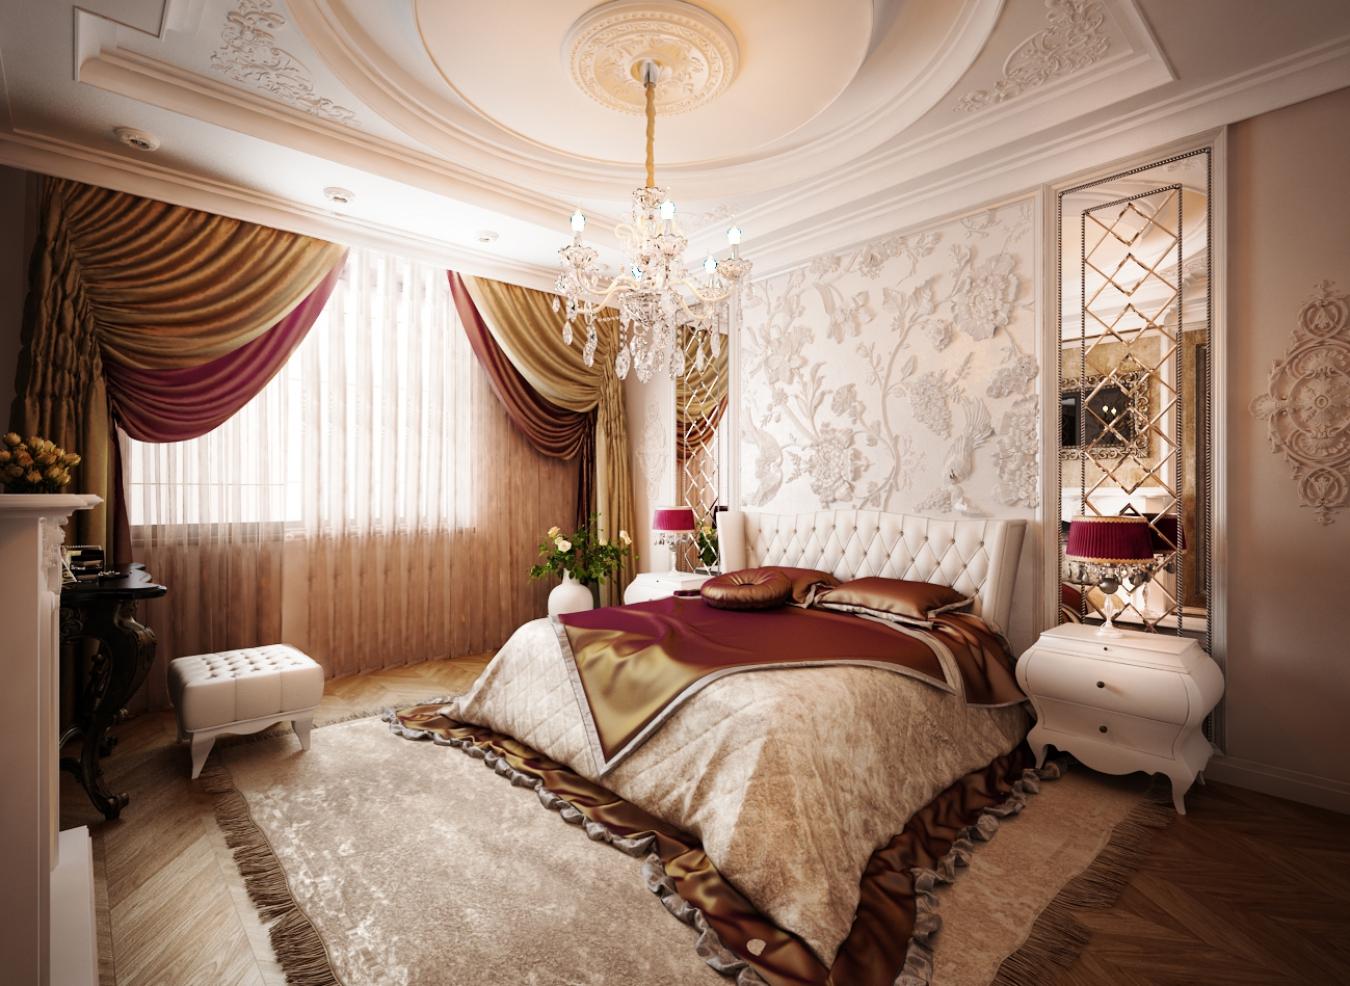 klassicheskiy_mebel_derevo_massiv_potolok_steni_otdelka_moskva_interier_design_dom_kvartira_office_r